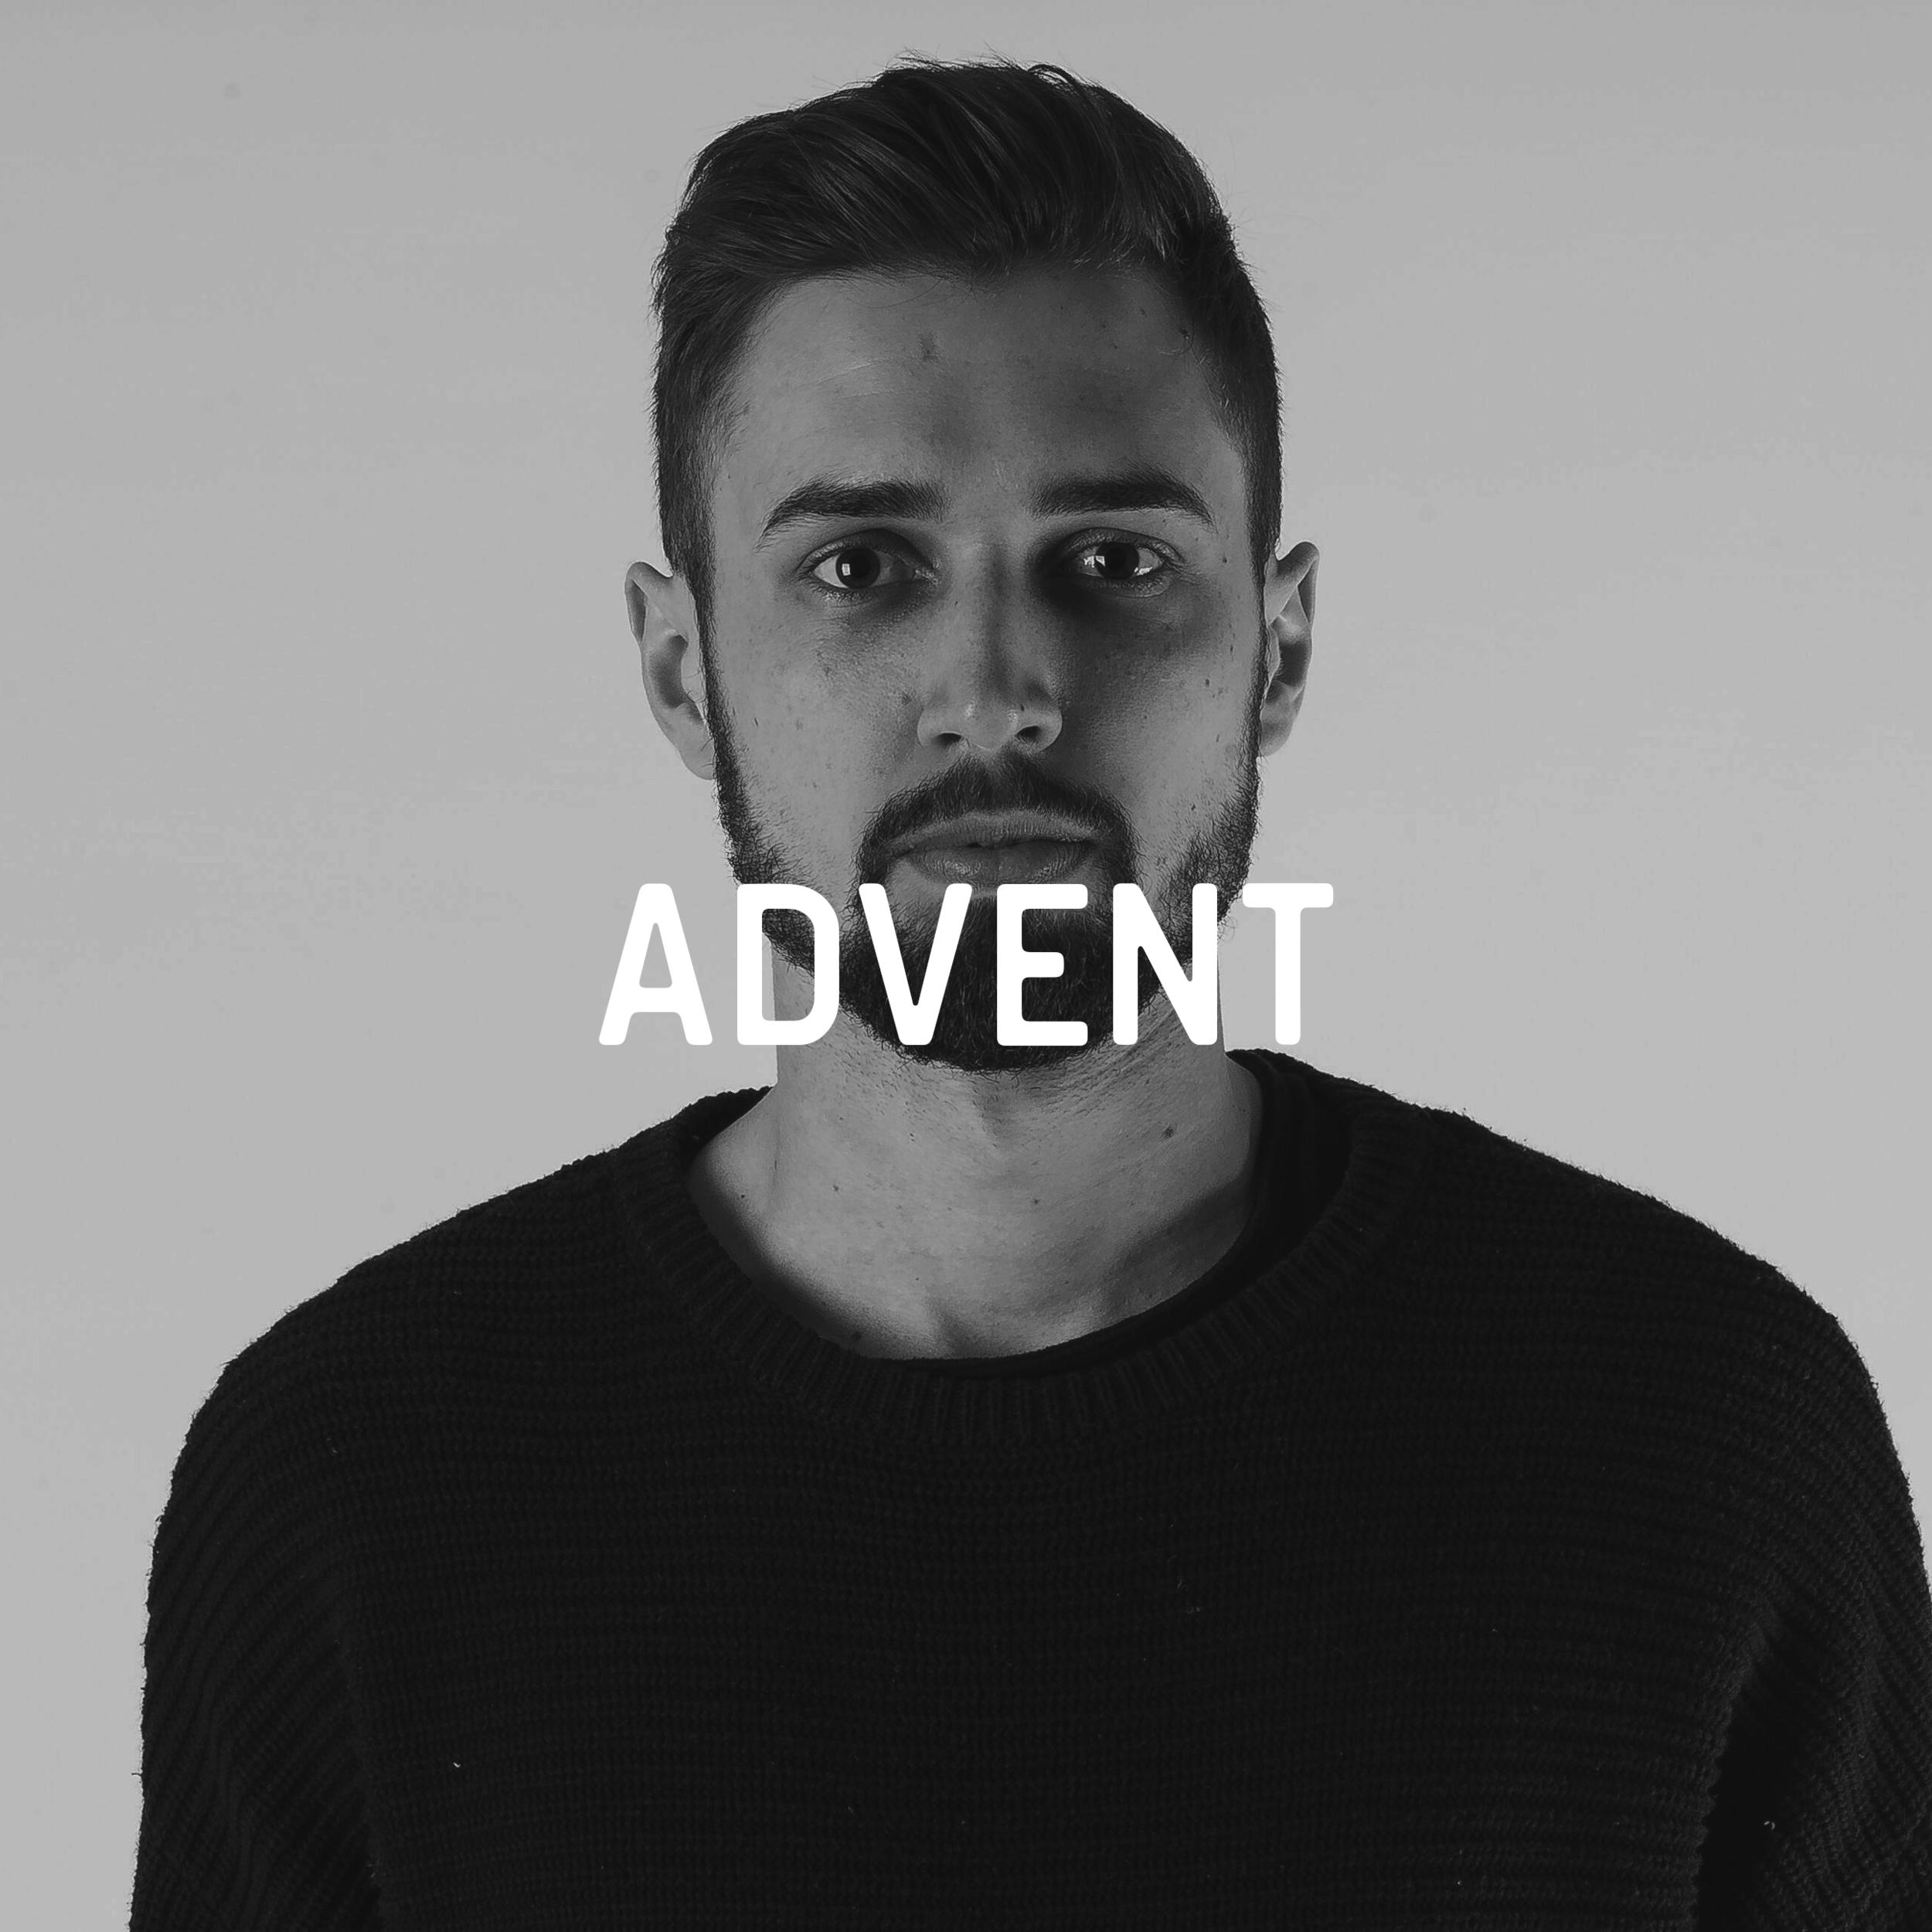 AdventArtist3.png